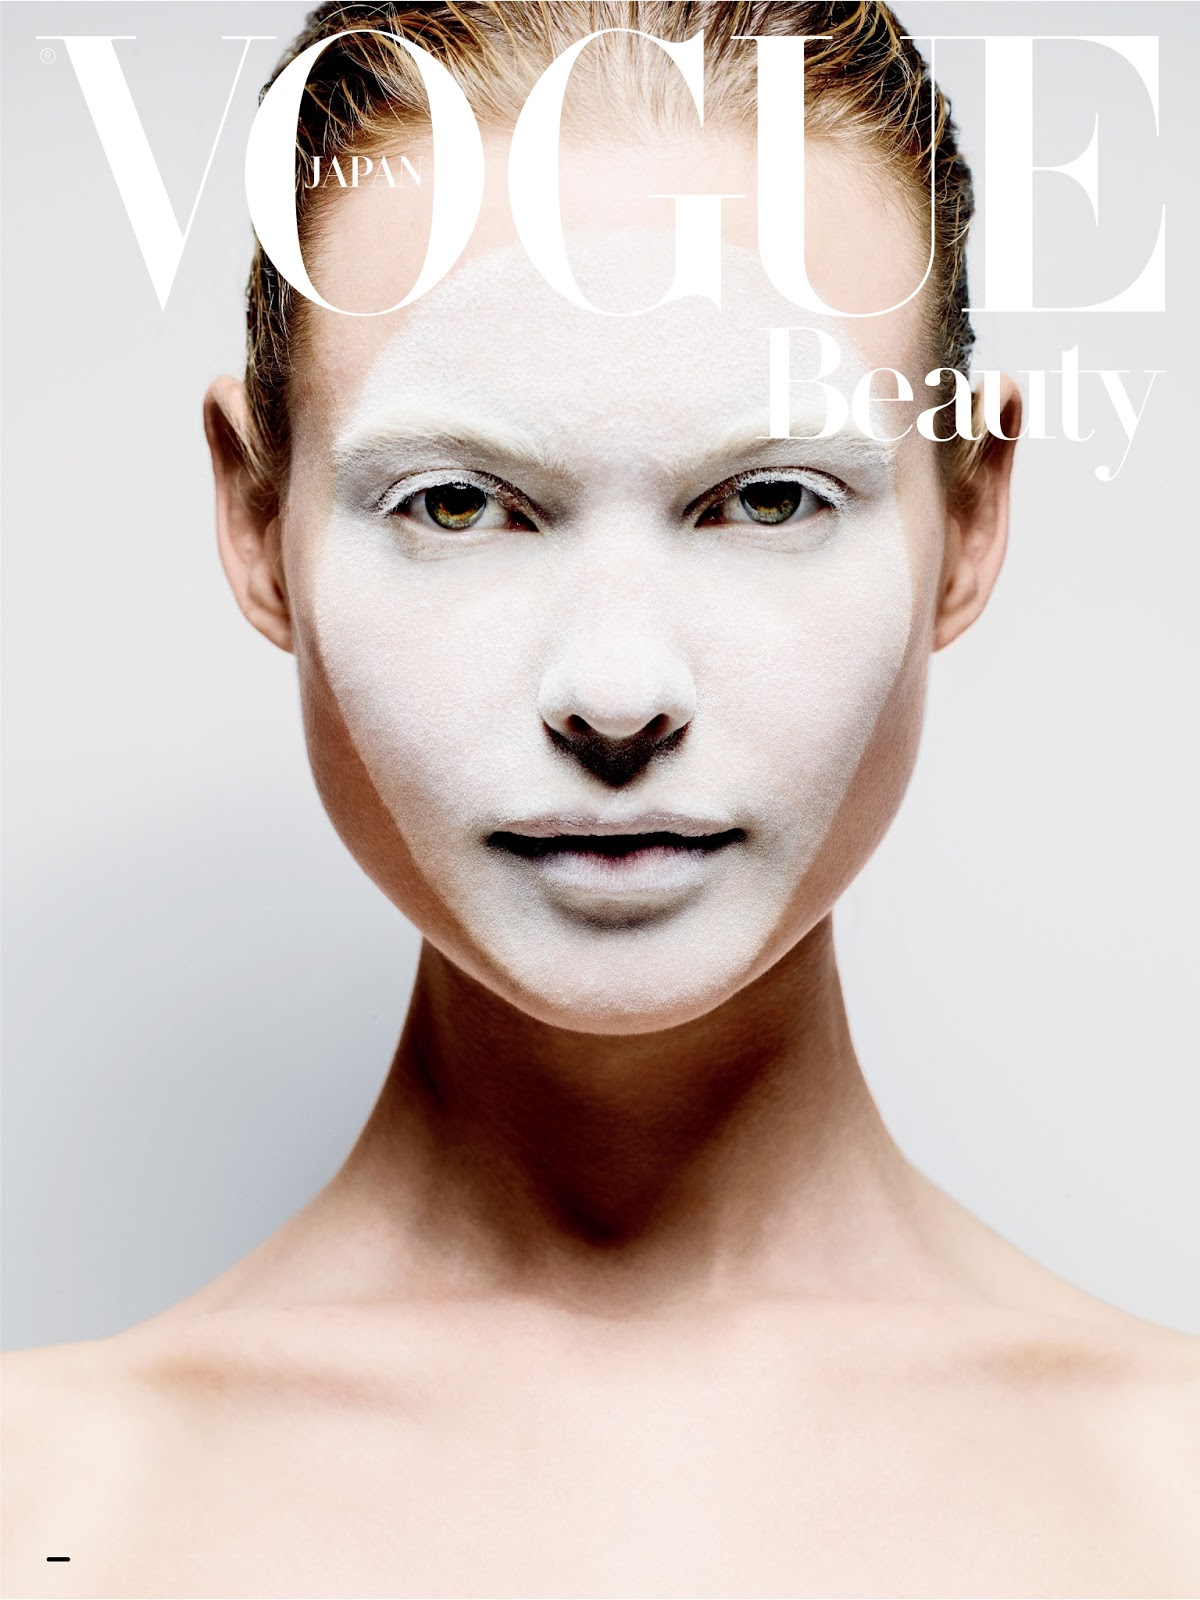 Behati Prinsloo by Liz Collins for Vogue Japan October 2013 (1)